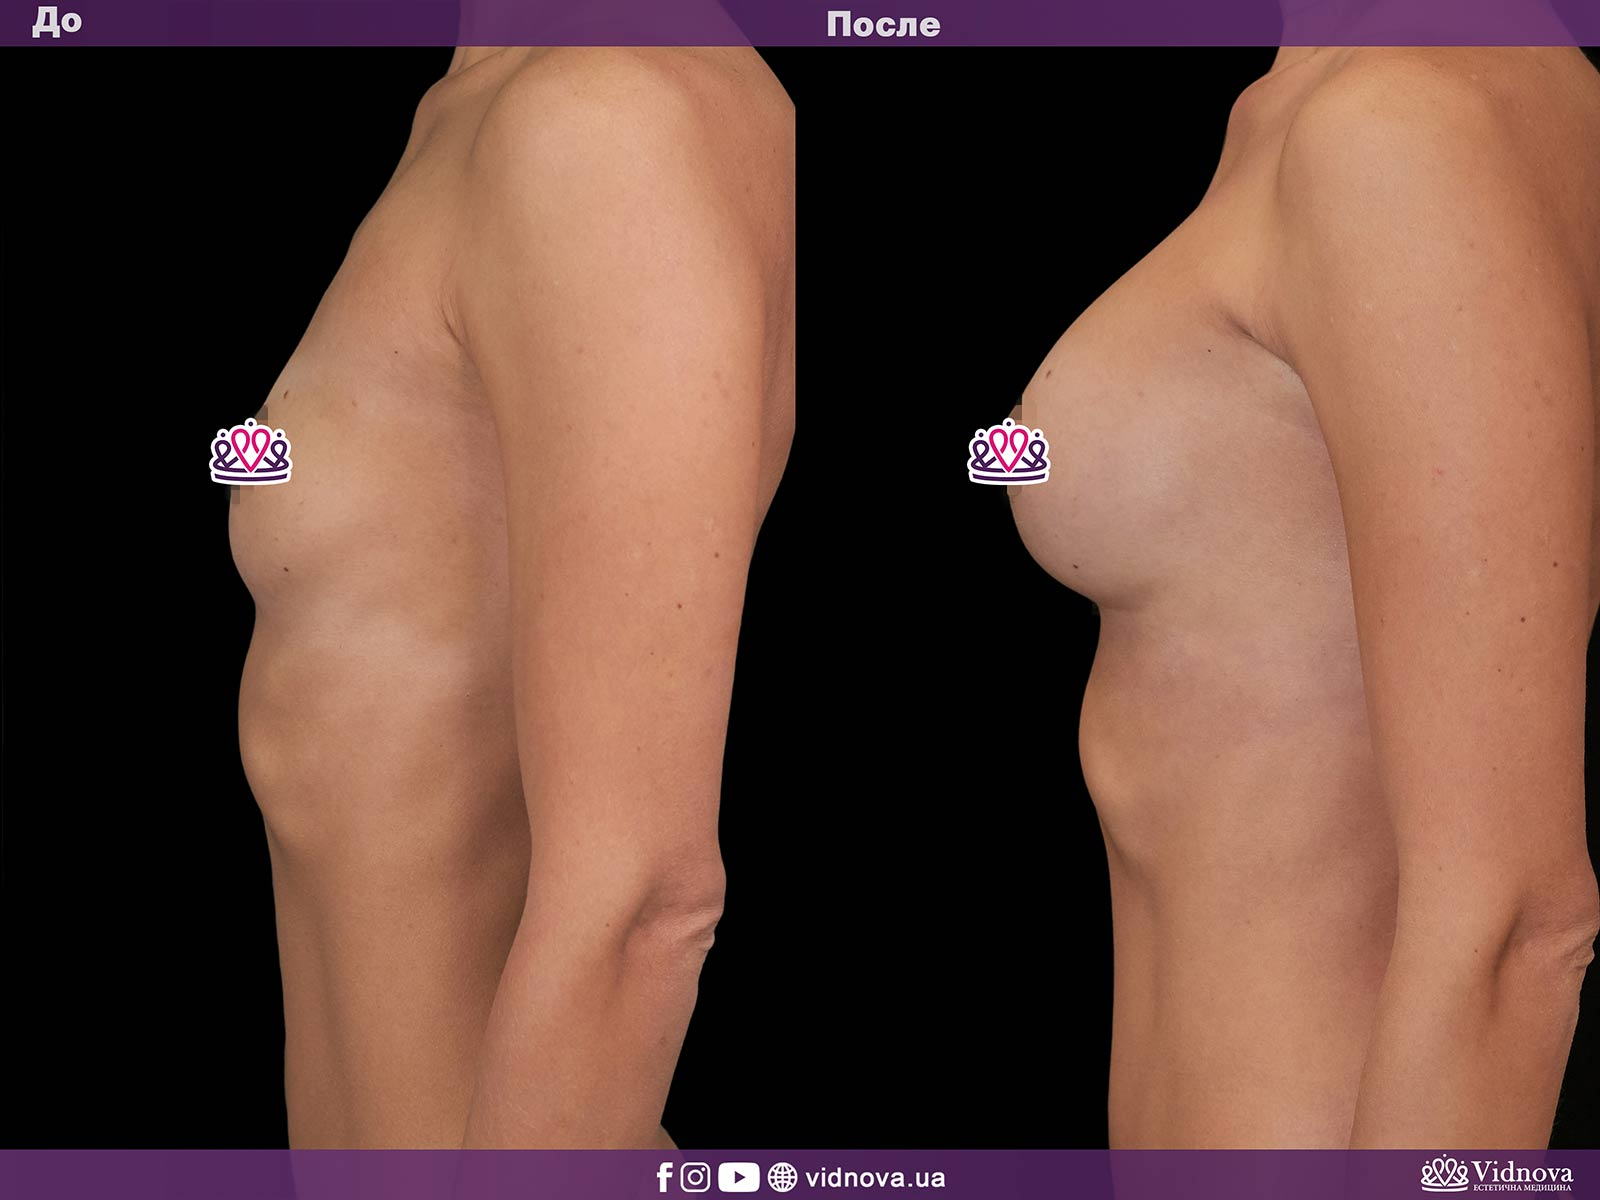 Увеличение груди: Фото ДО и ПОСЛЕ - Пример №13-3 - Клиника Vidnova